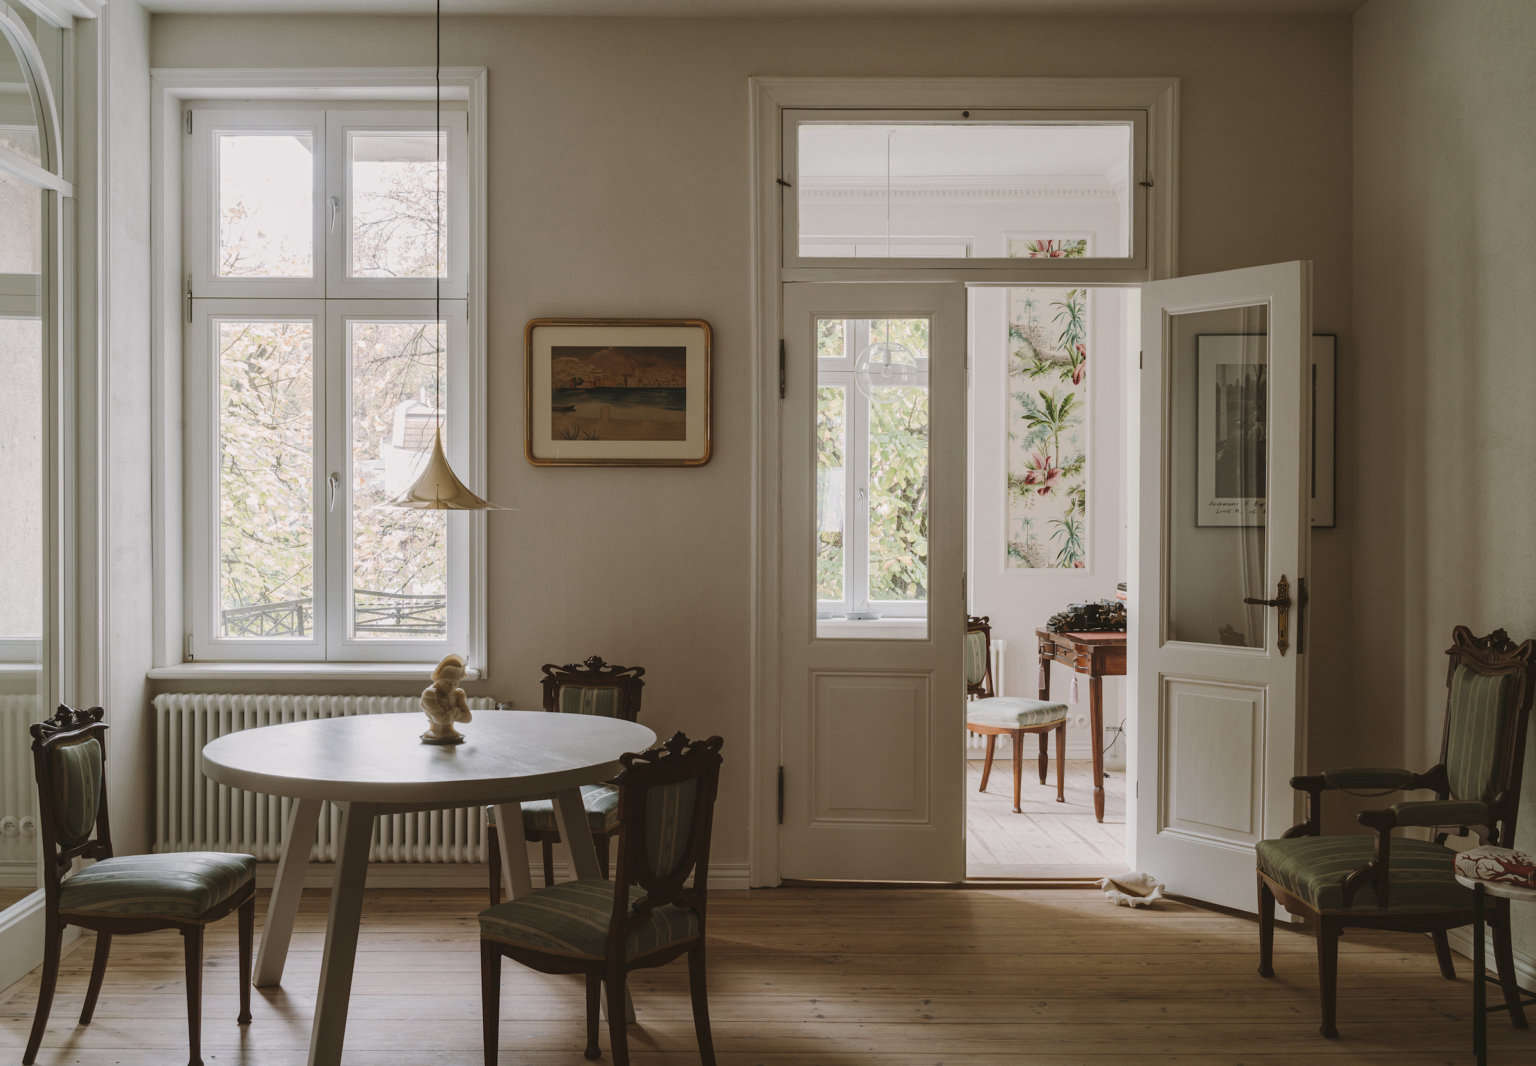 colombe studio sopot apartment pion dining